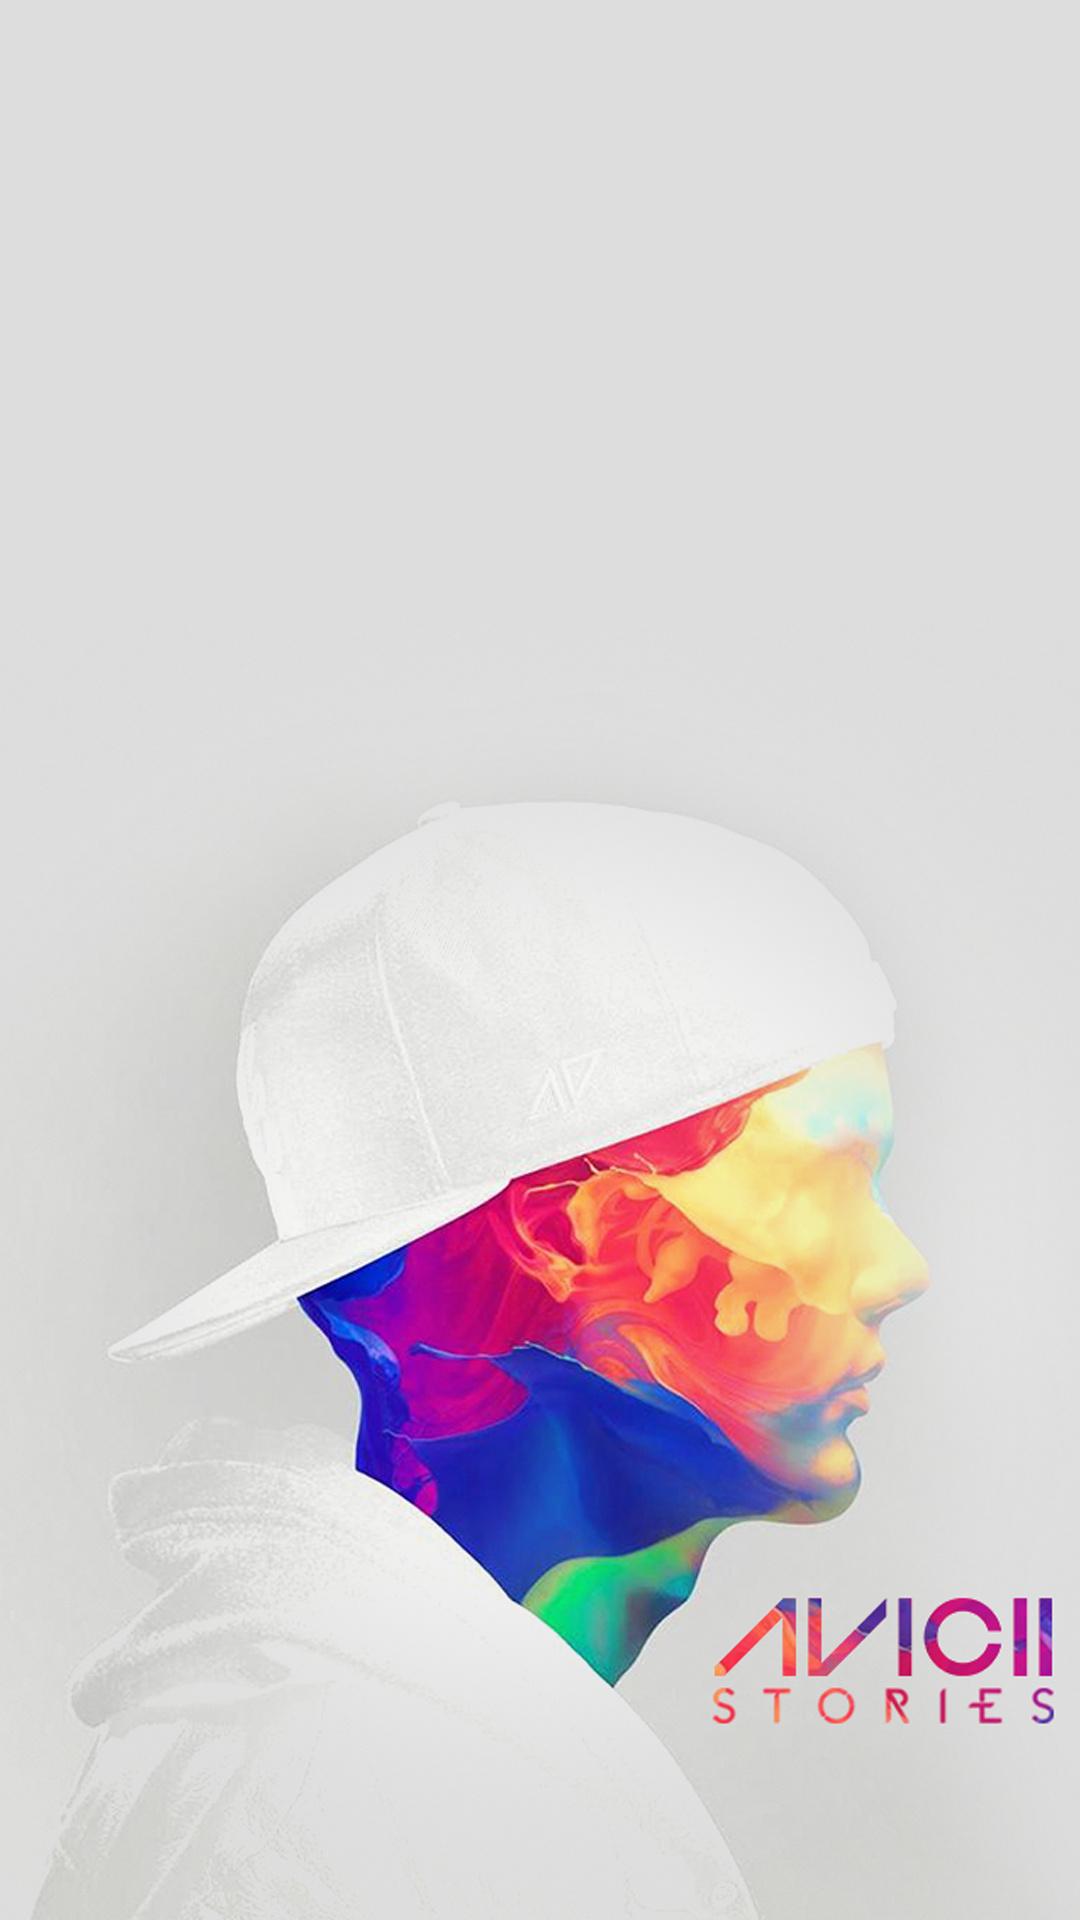 iPhone wallpaper avicii 1 Avicii